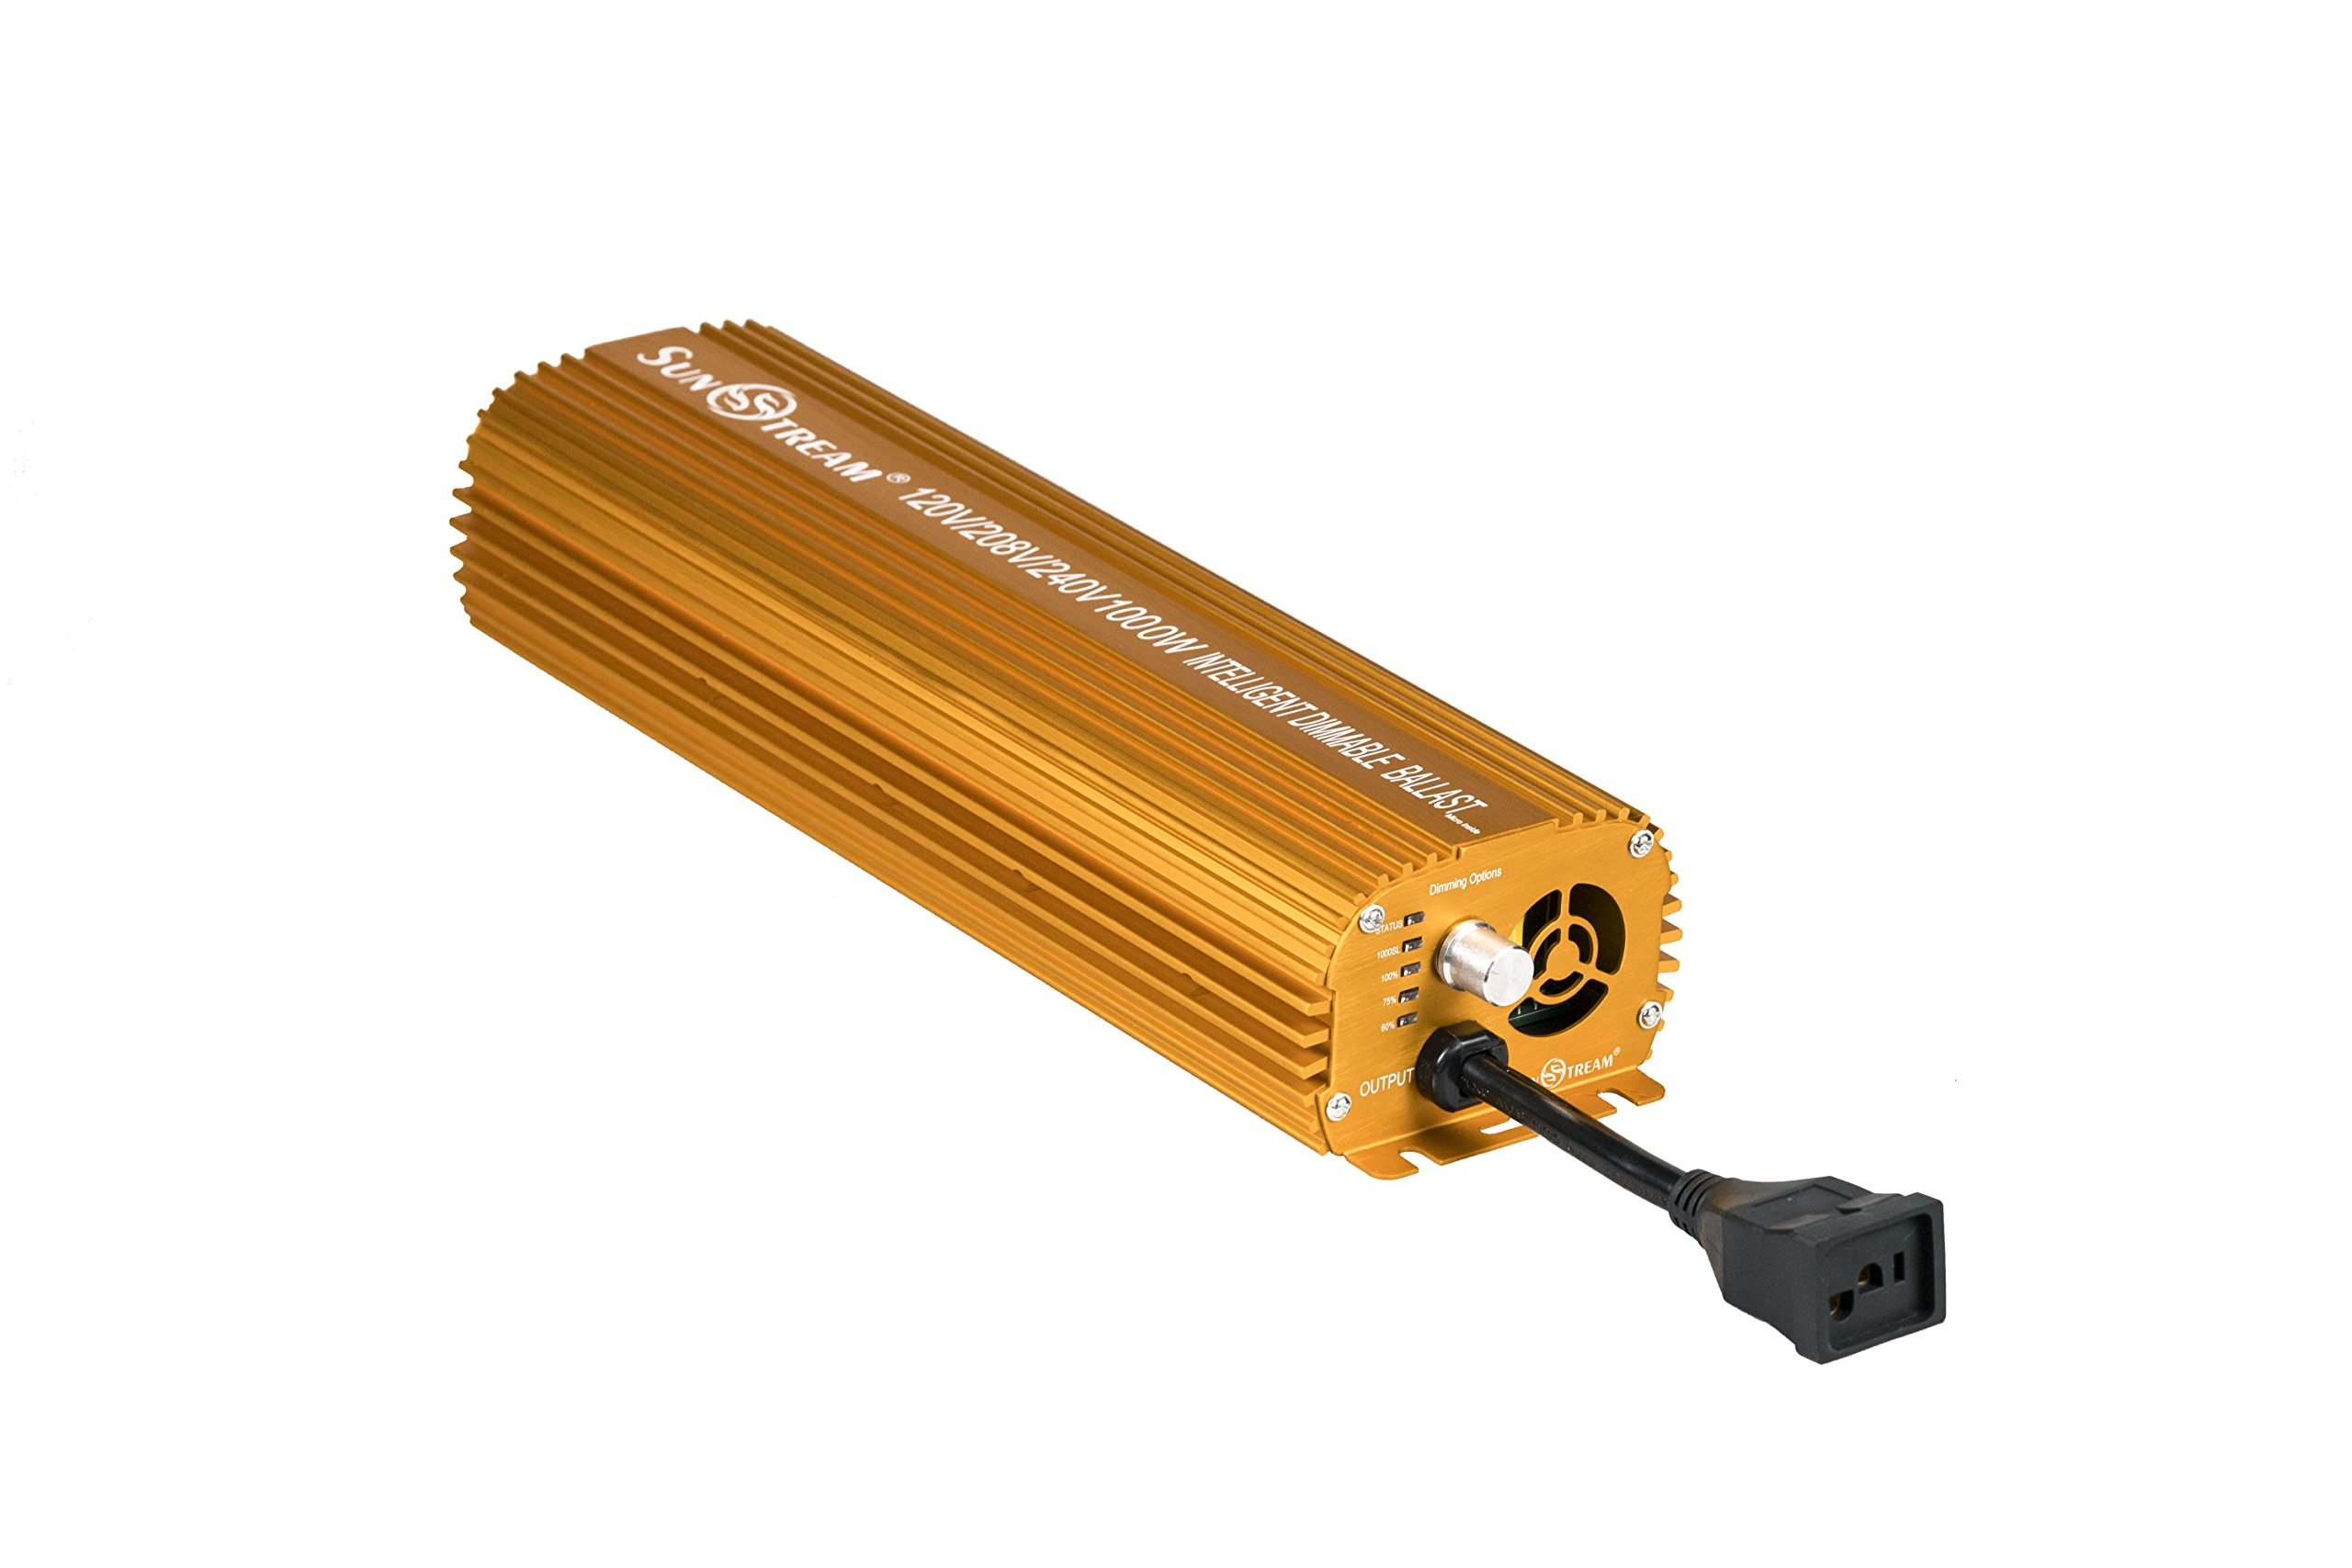 SunStream 1000 Watt Dimmable Electronic Ballast for Grow Lights MH/HPS (1000w) (Full Version)